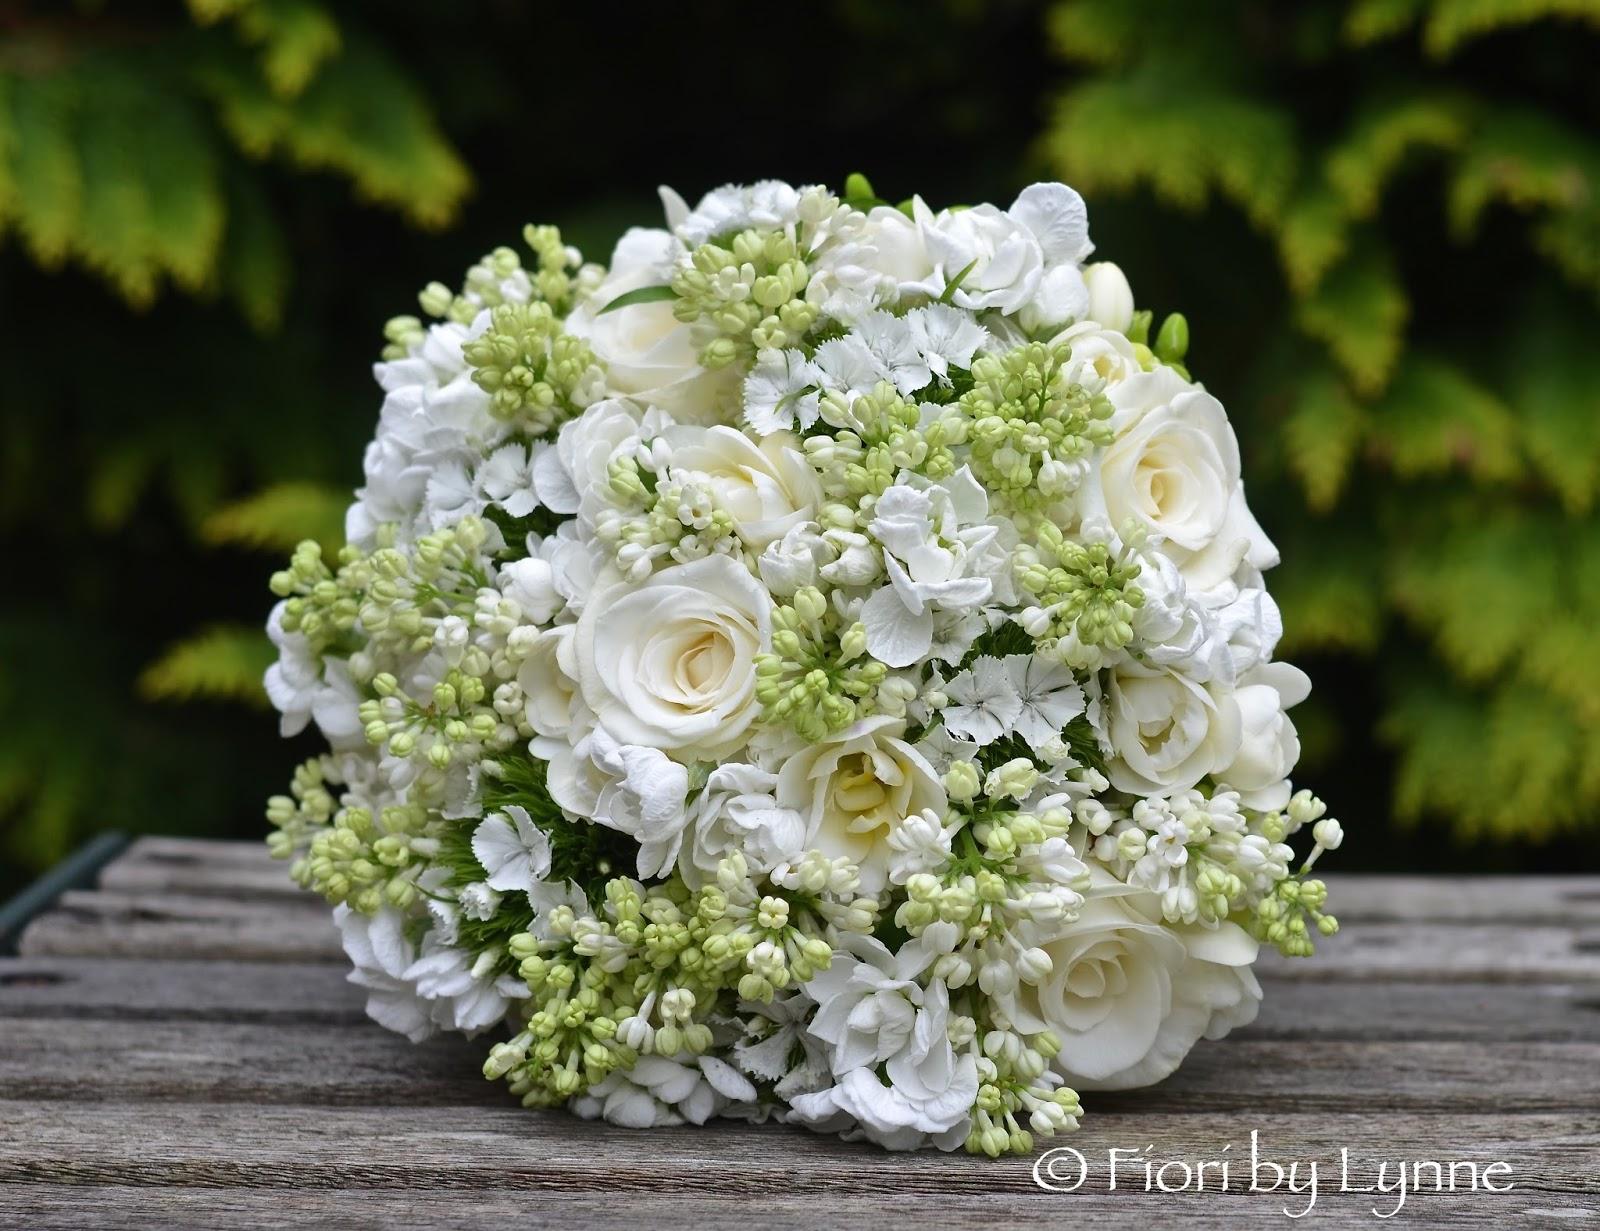 Wedding Flowers Blog: Harriett's Spring Wedding Flowers